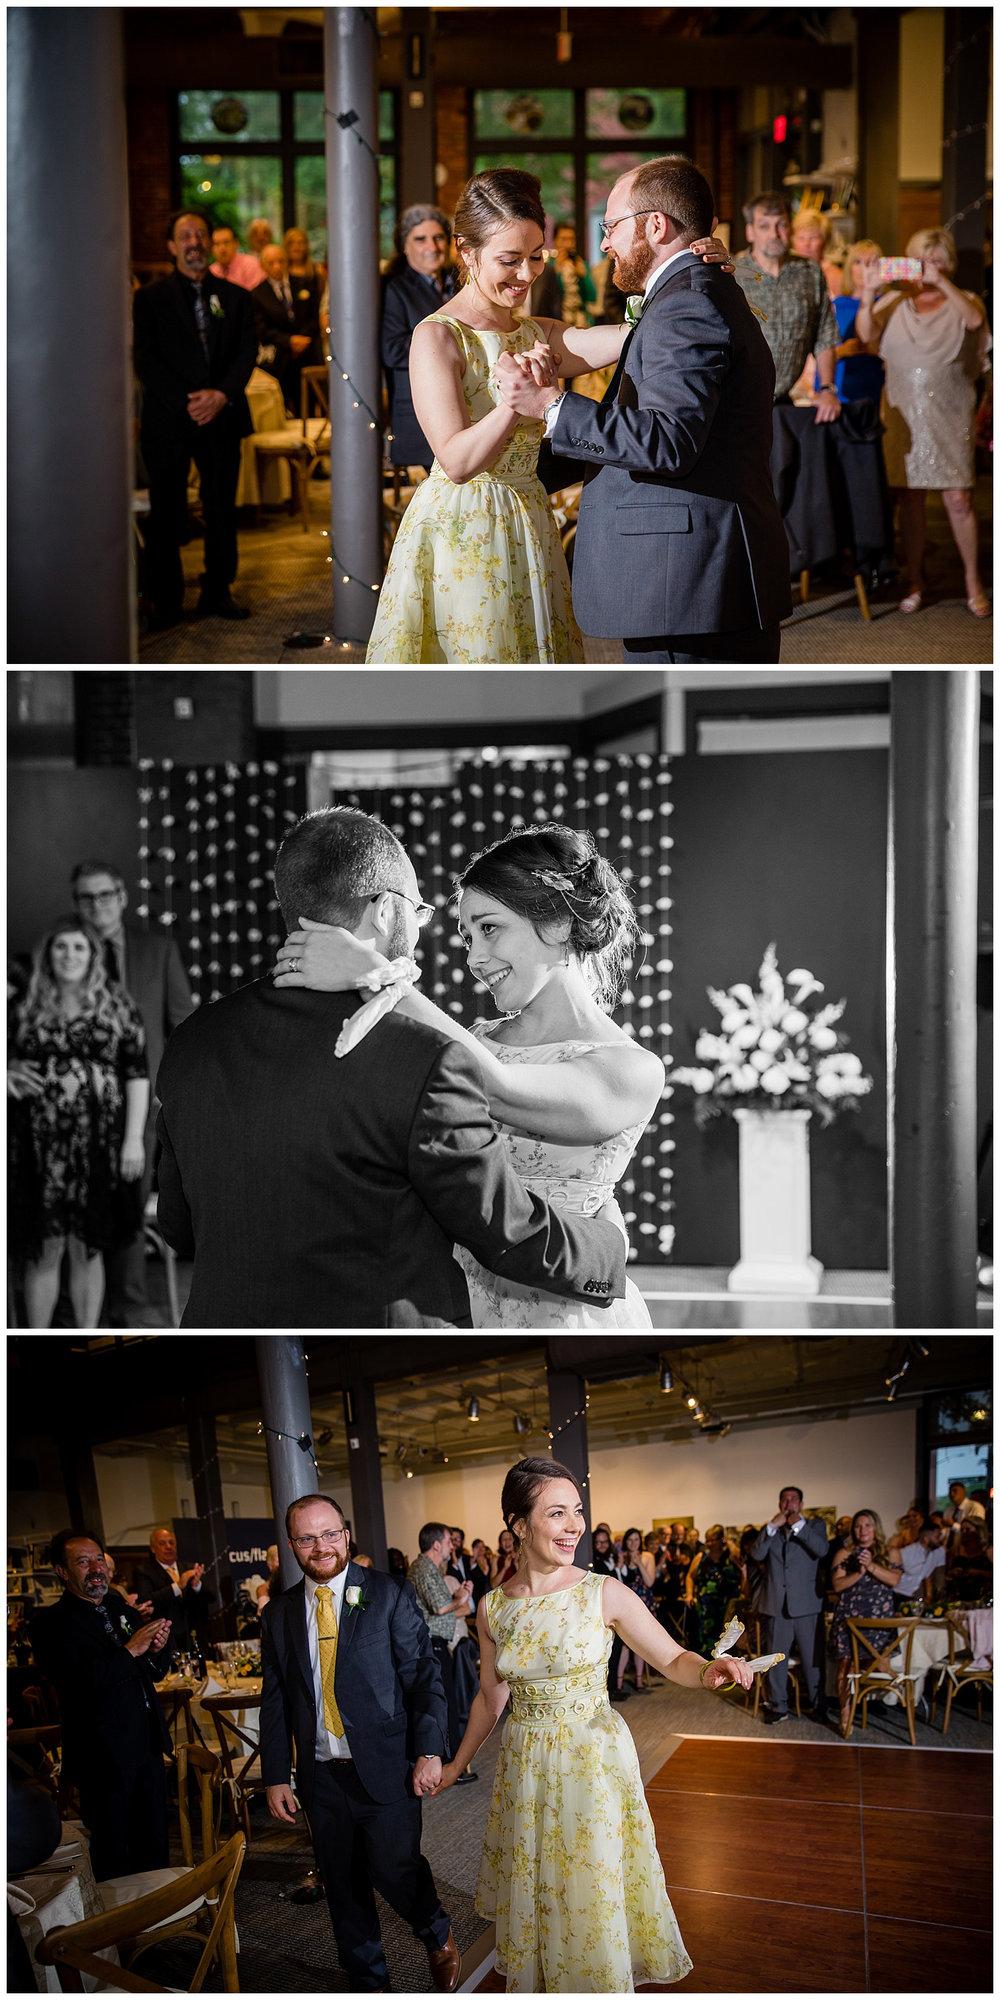 Lynn-Musuem-Wedding-Boston-Photographer-26-North-Studios-026.jpg